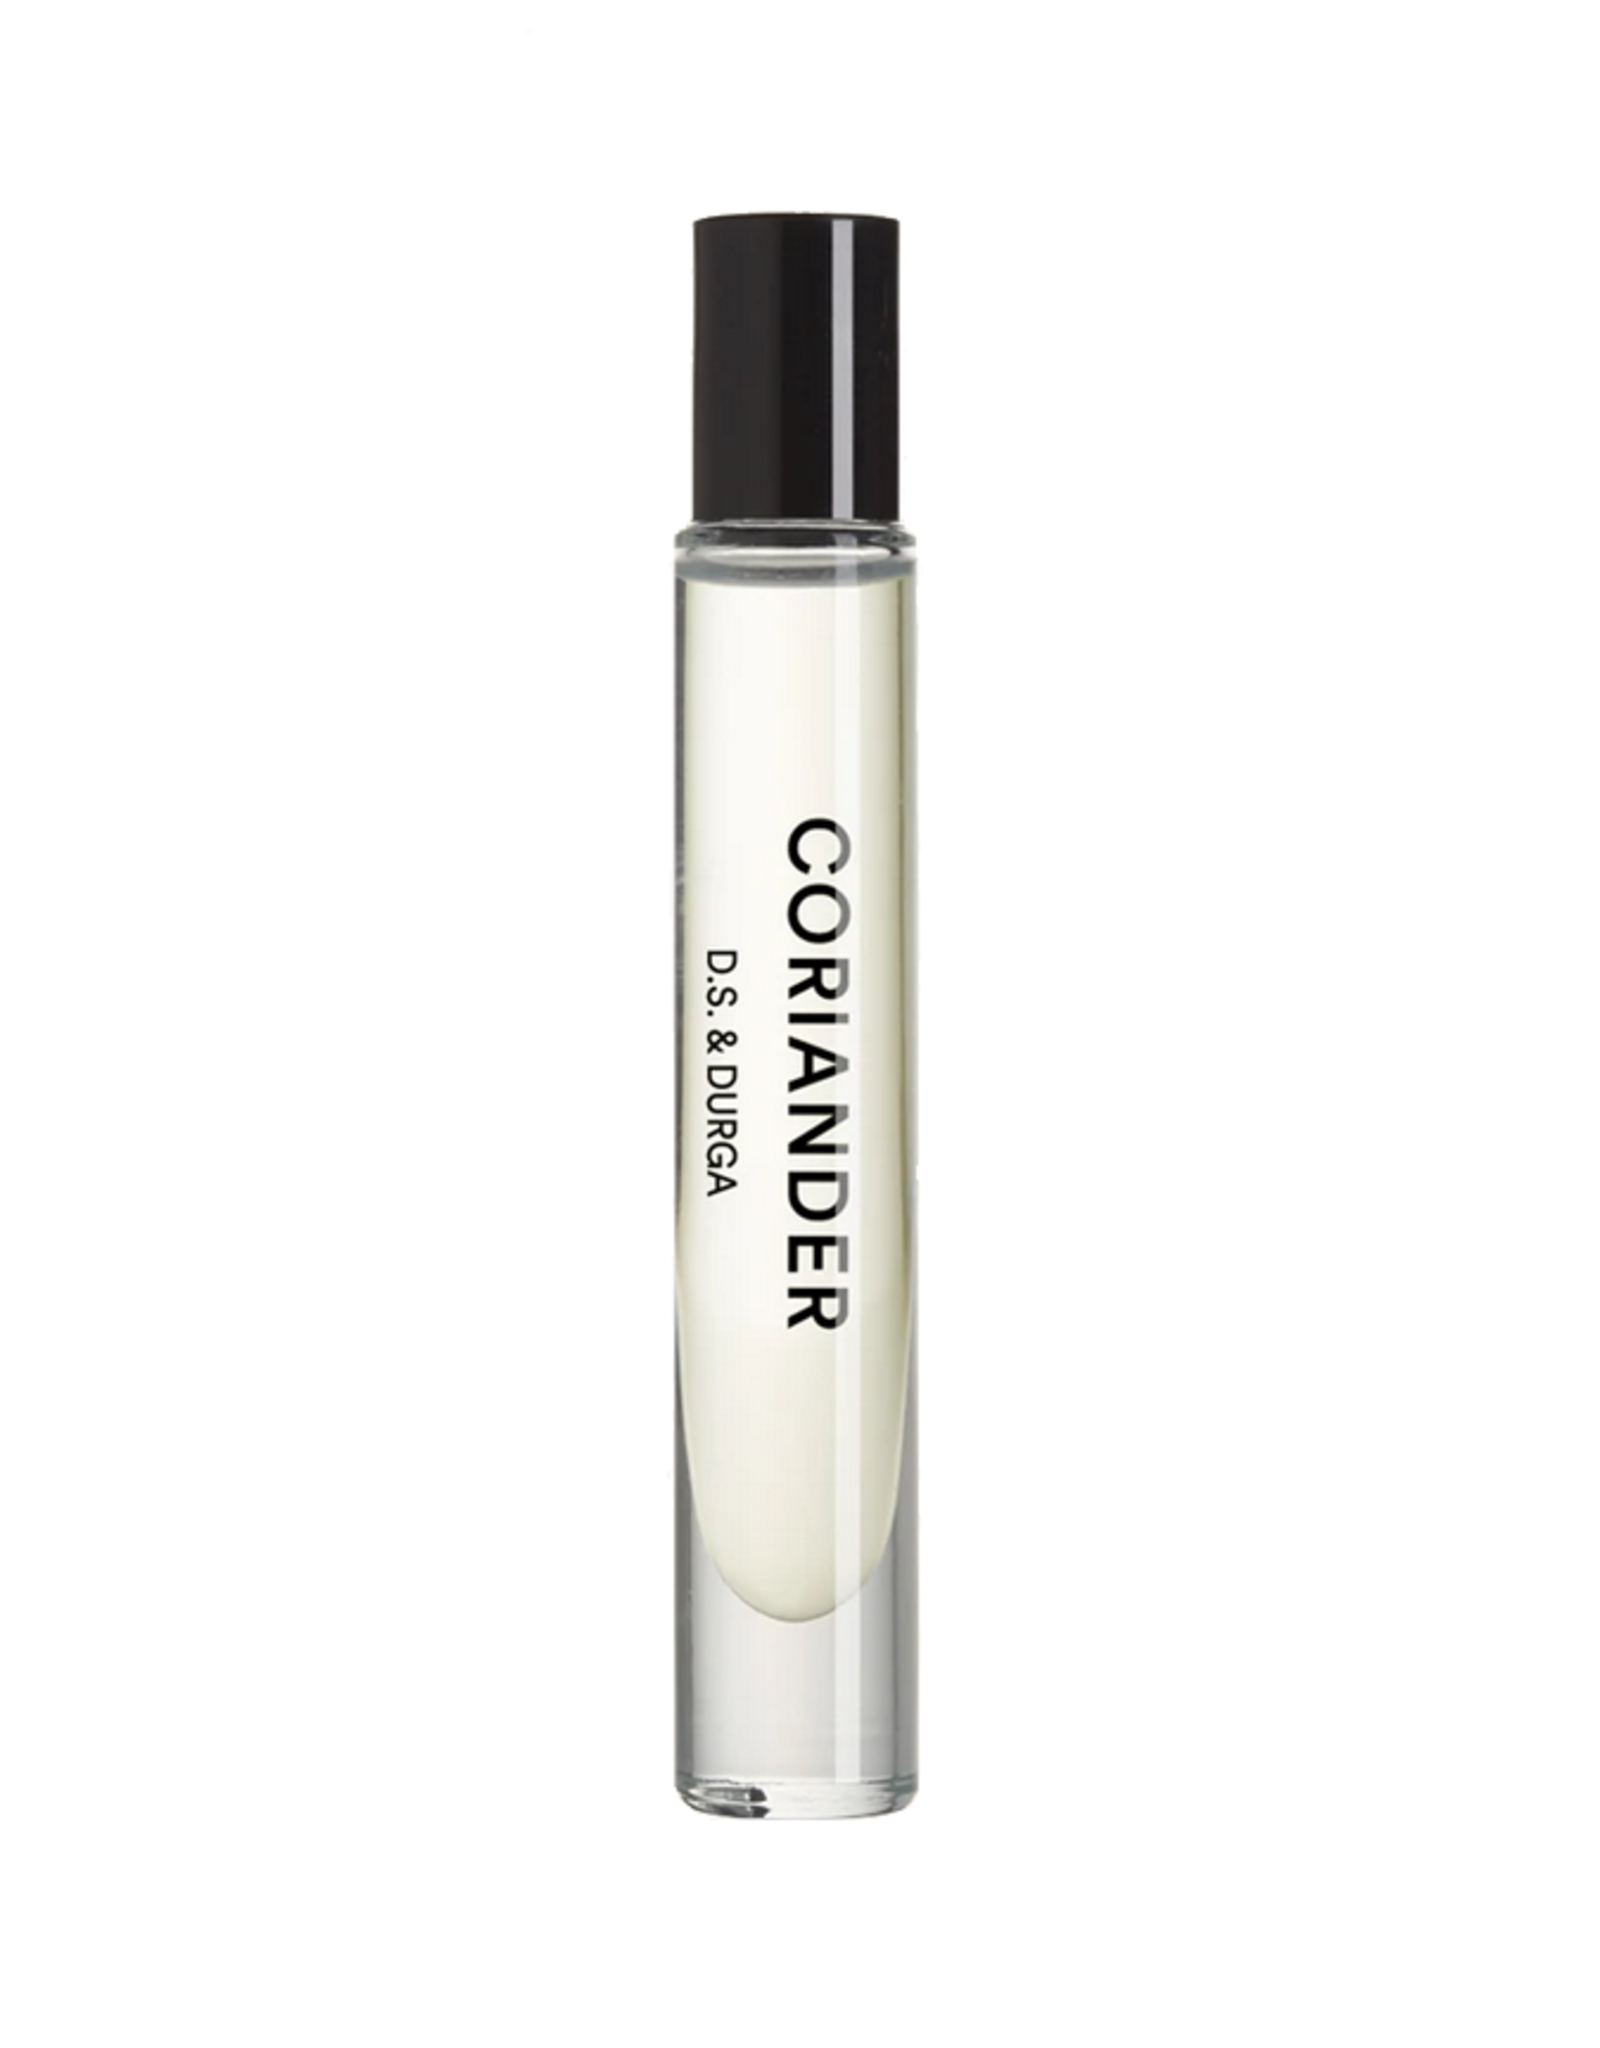 D.S. & DURGA Coriander - Pocket Perfume - 10mL